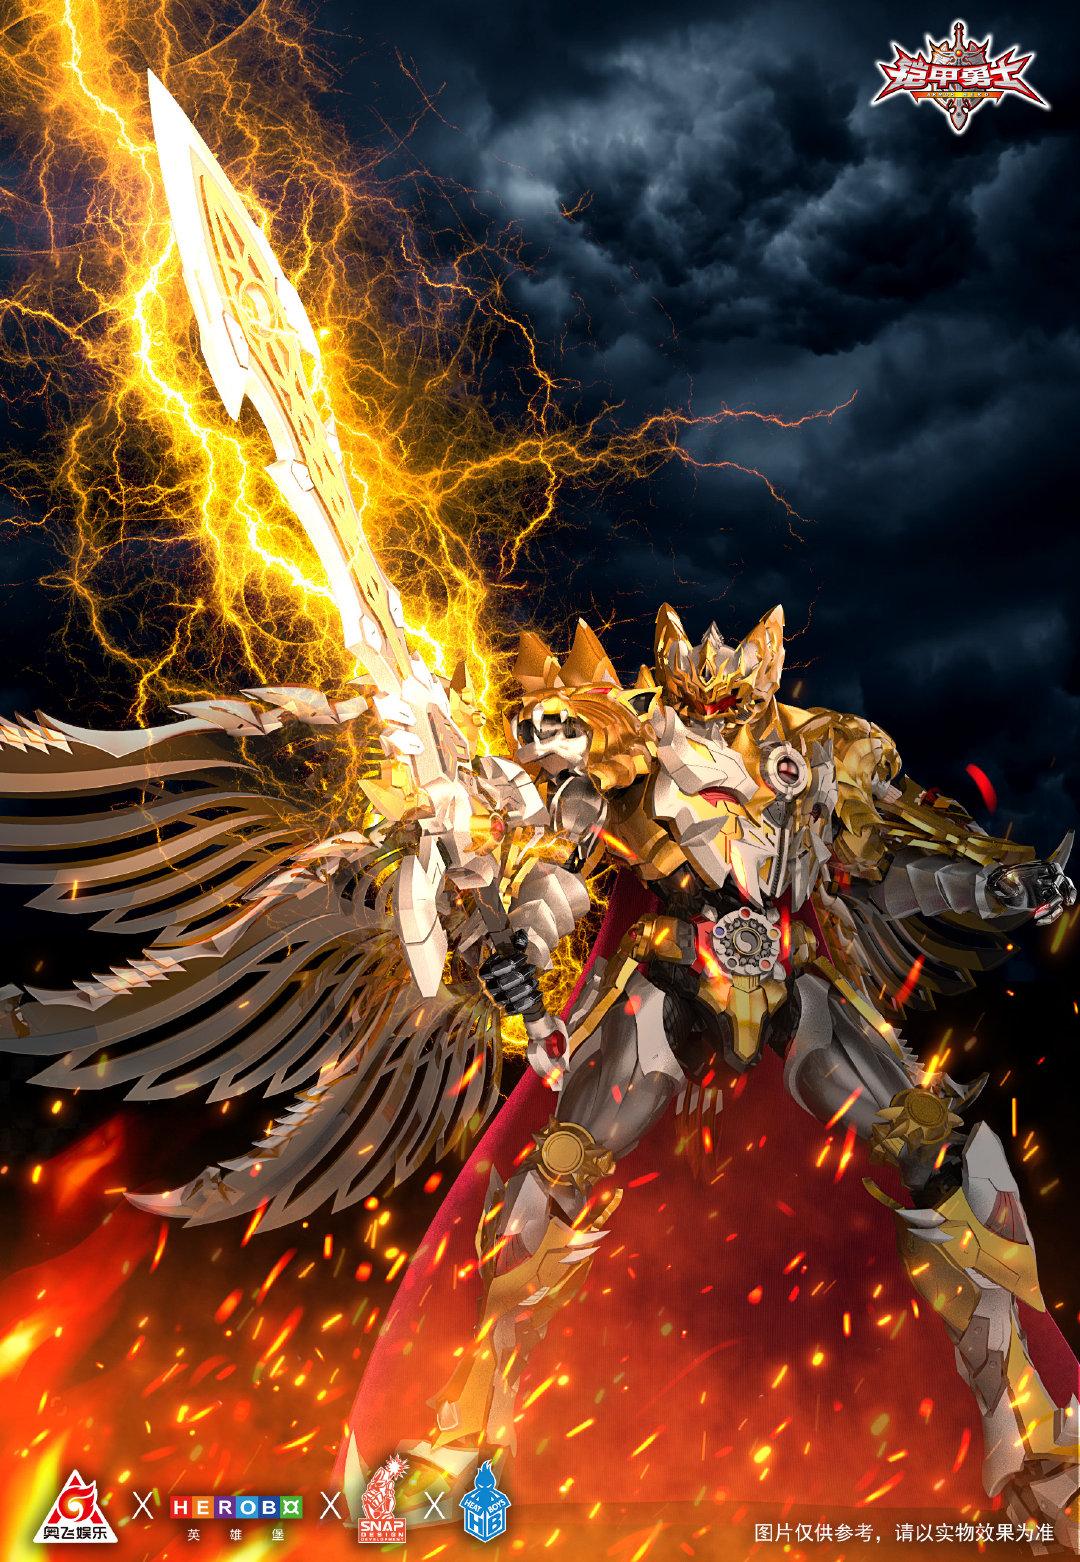 S535_Armor_hero_Emperor_027.jpg